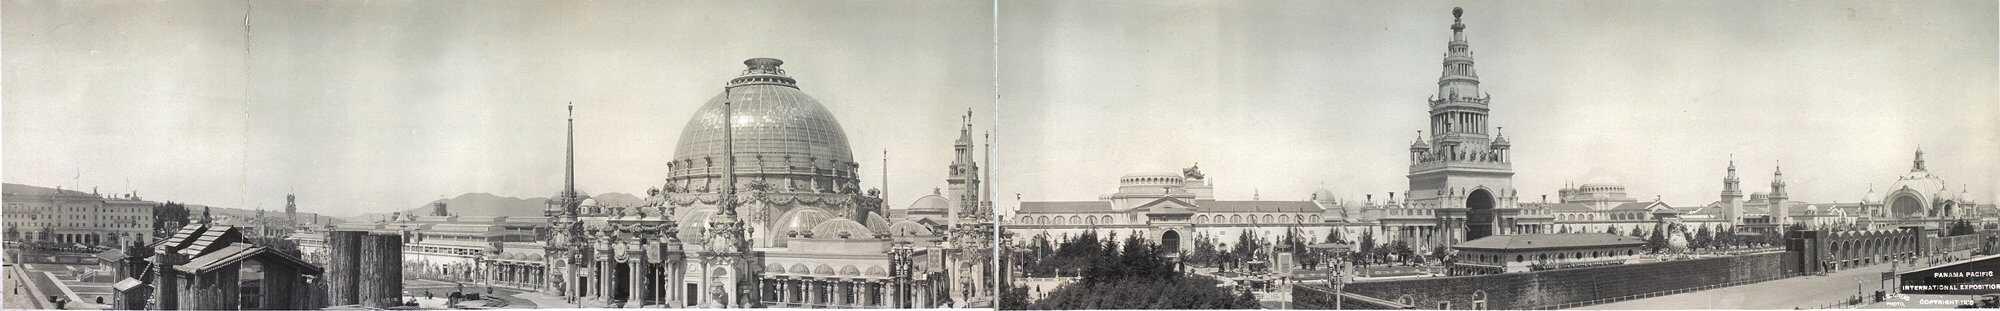 Ansel-Panama-Exposition-1915-LOC.jpg